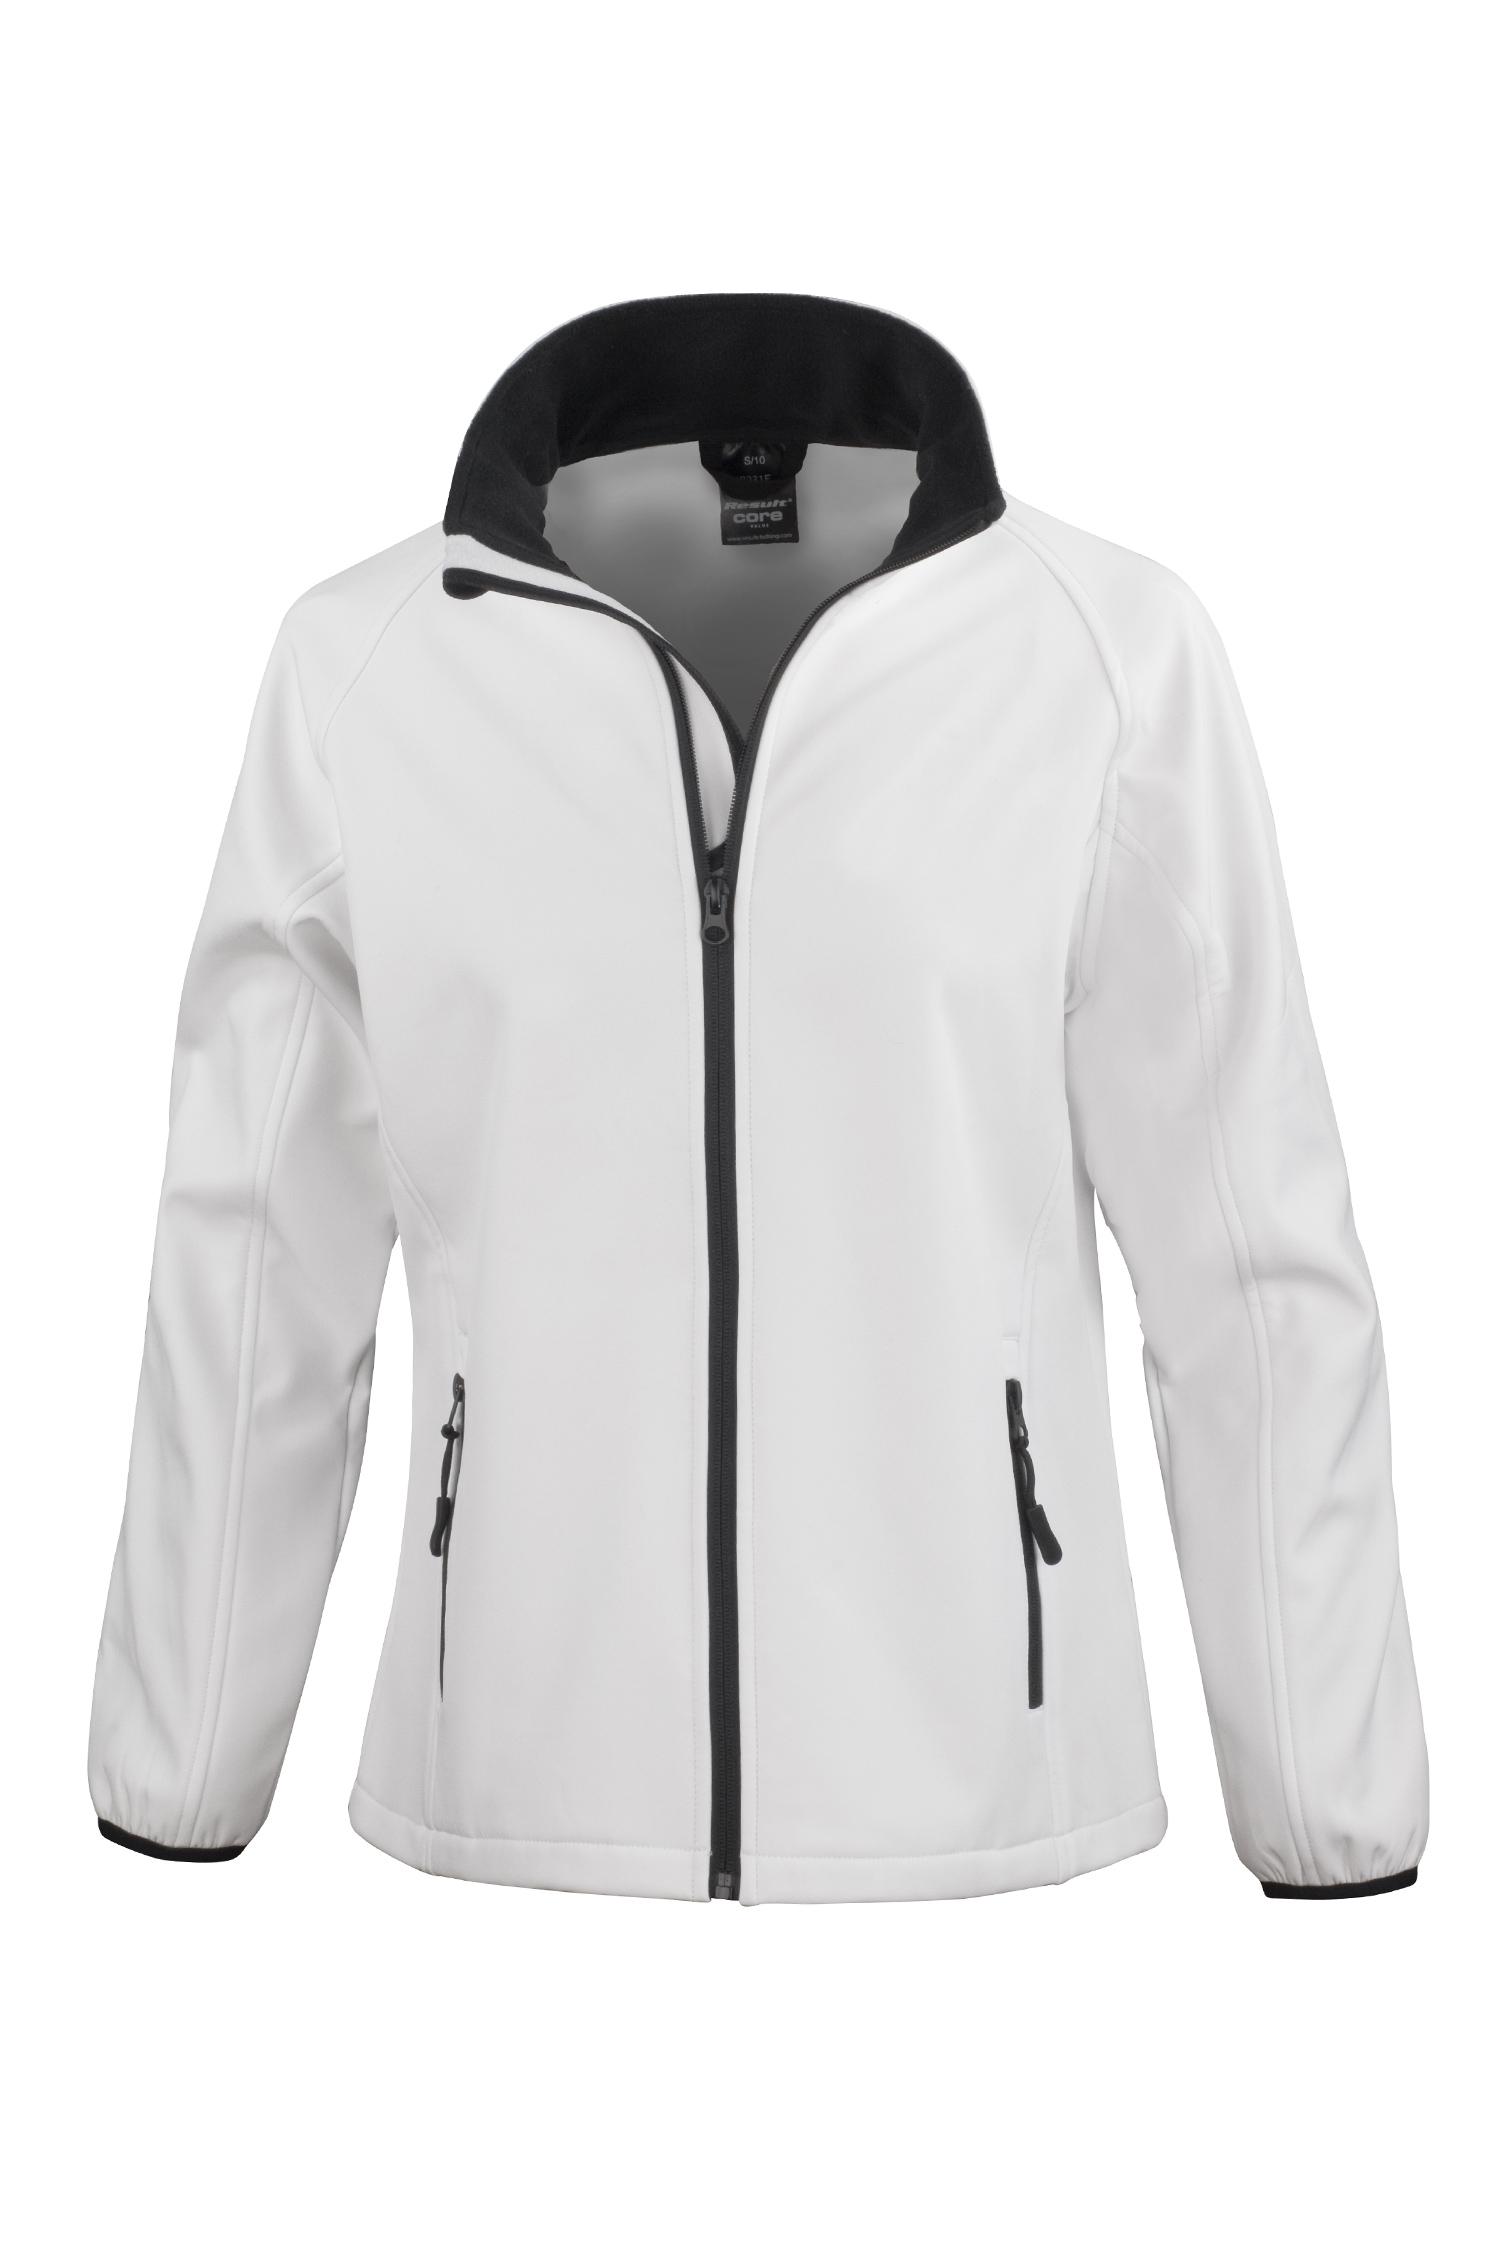 Naiste softshell jakk 12